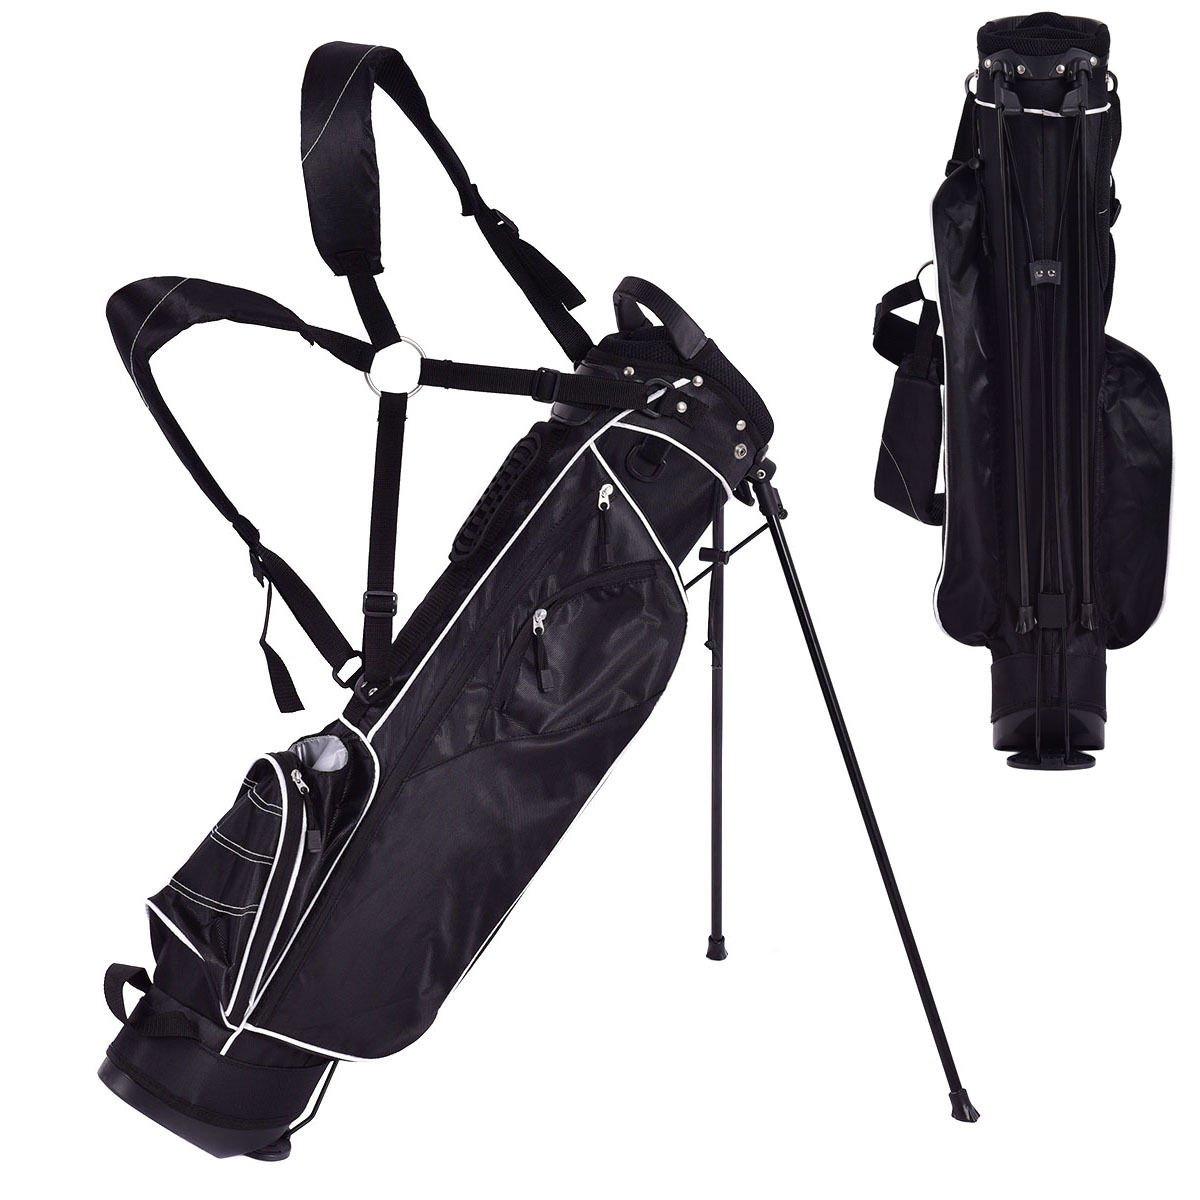 Amazon.com : Tangkula Golf Bag w/4 Way Divider Stand Cart Bag (Black ...